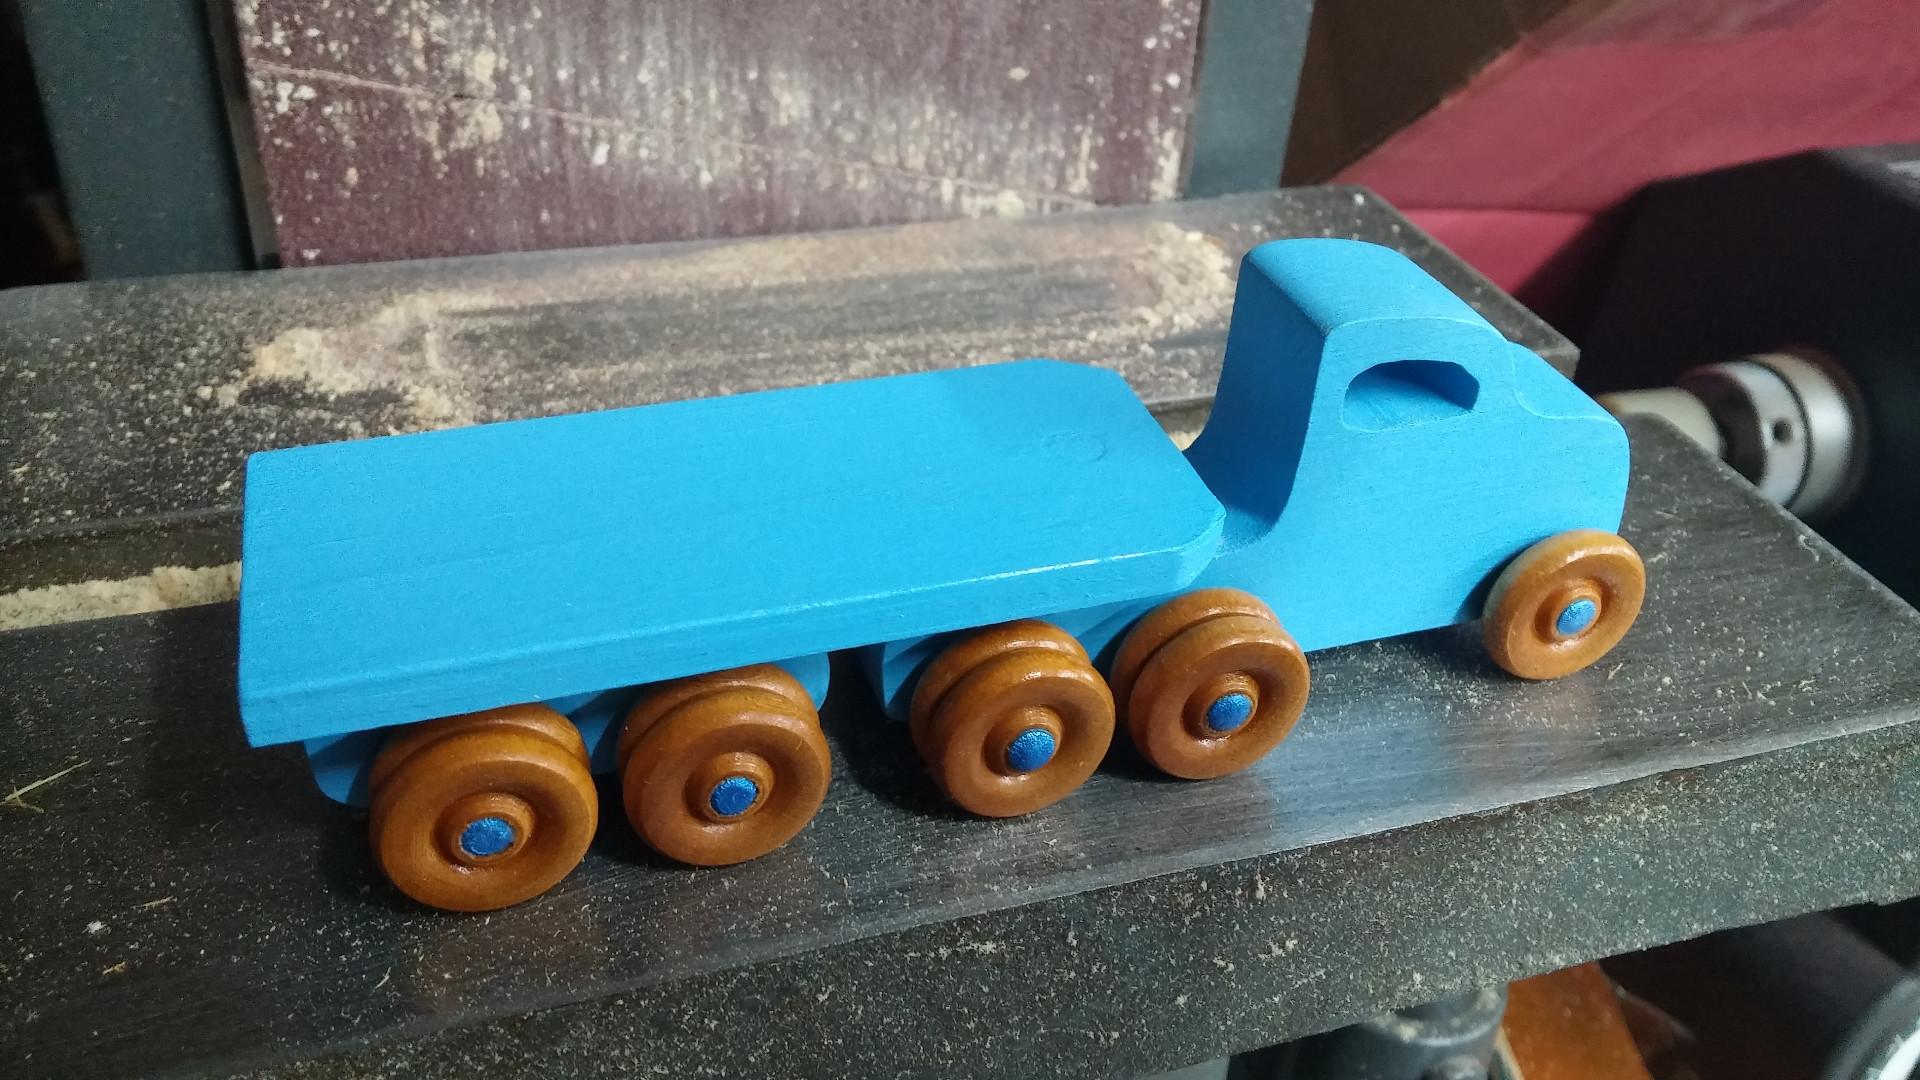 2017-05-03 17.15.24-handmade-play-pal-blue-wooden-toy-truck-tractor-trailer.jpg